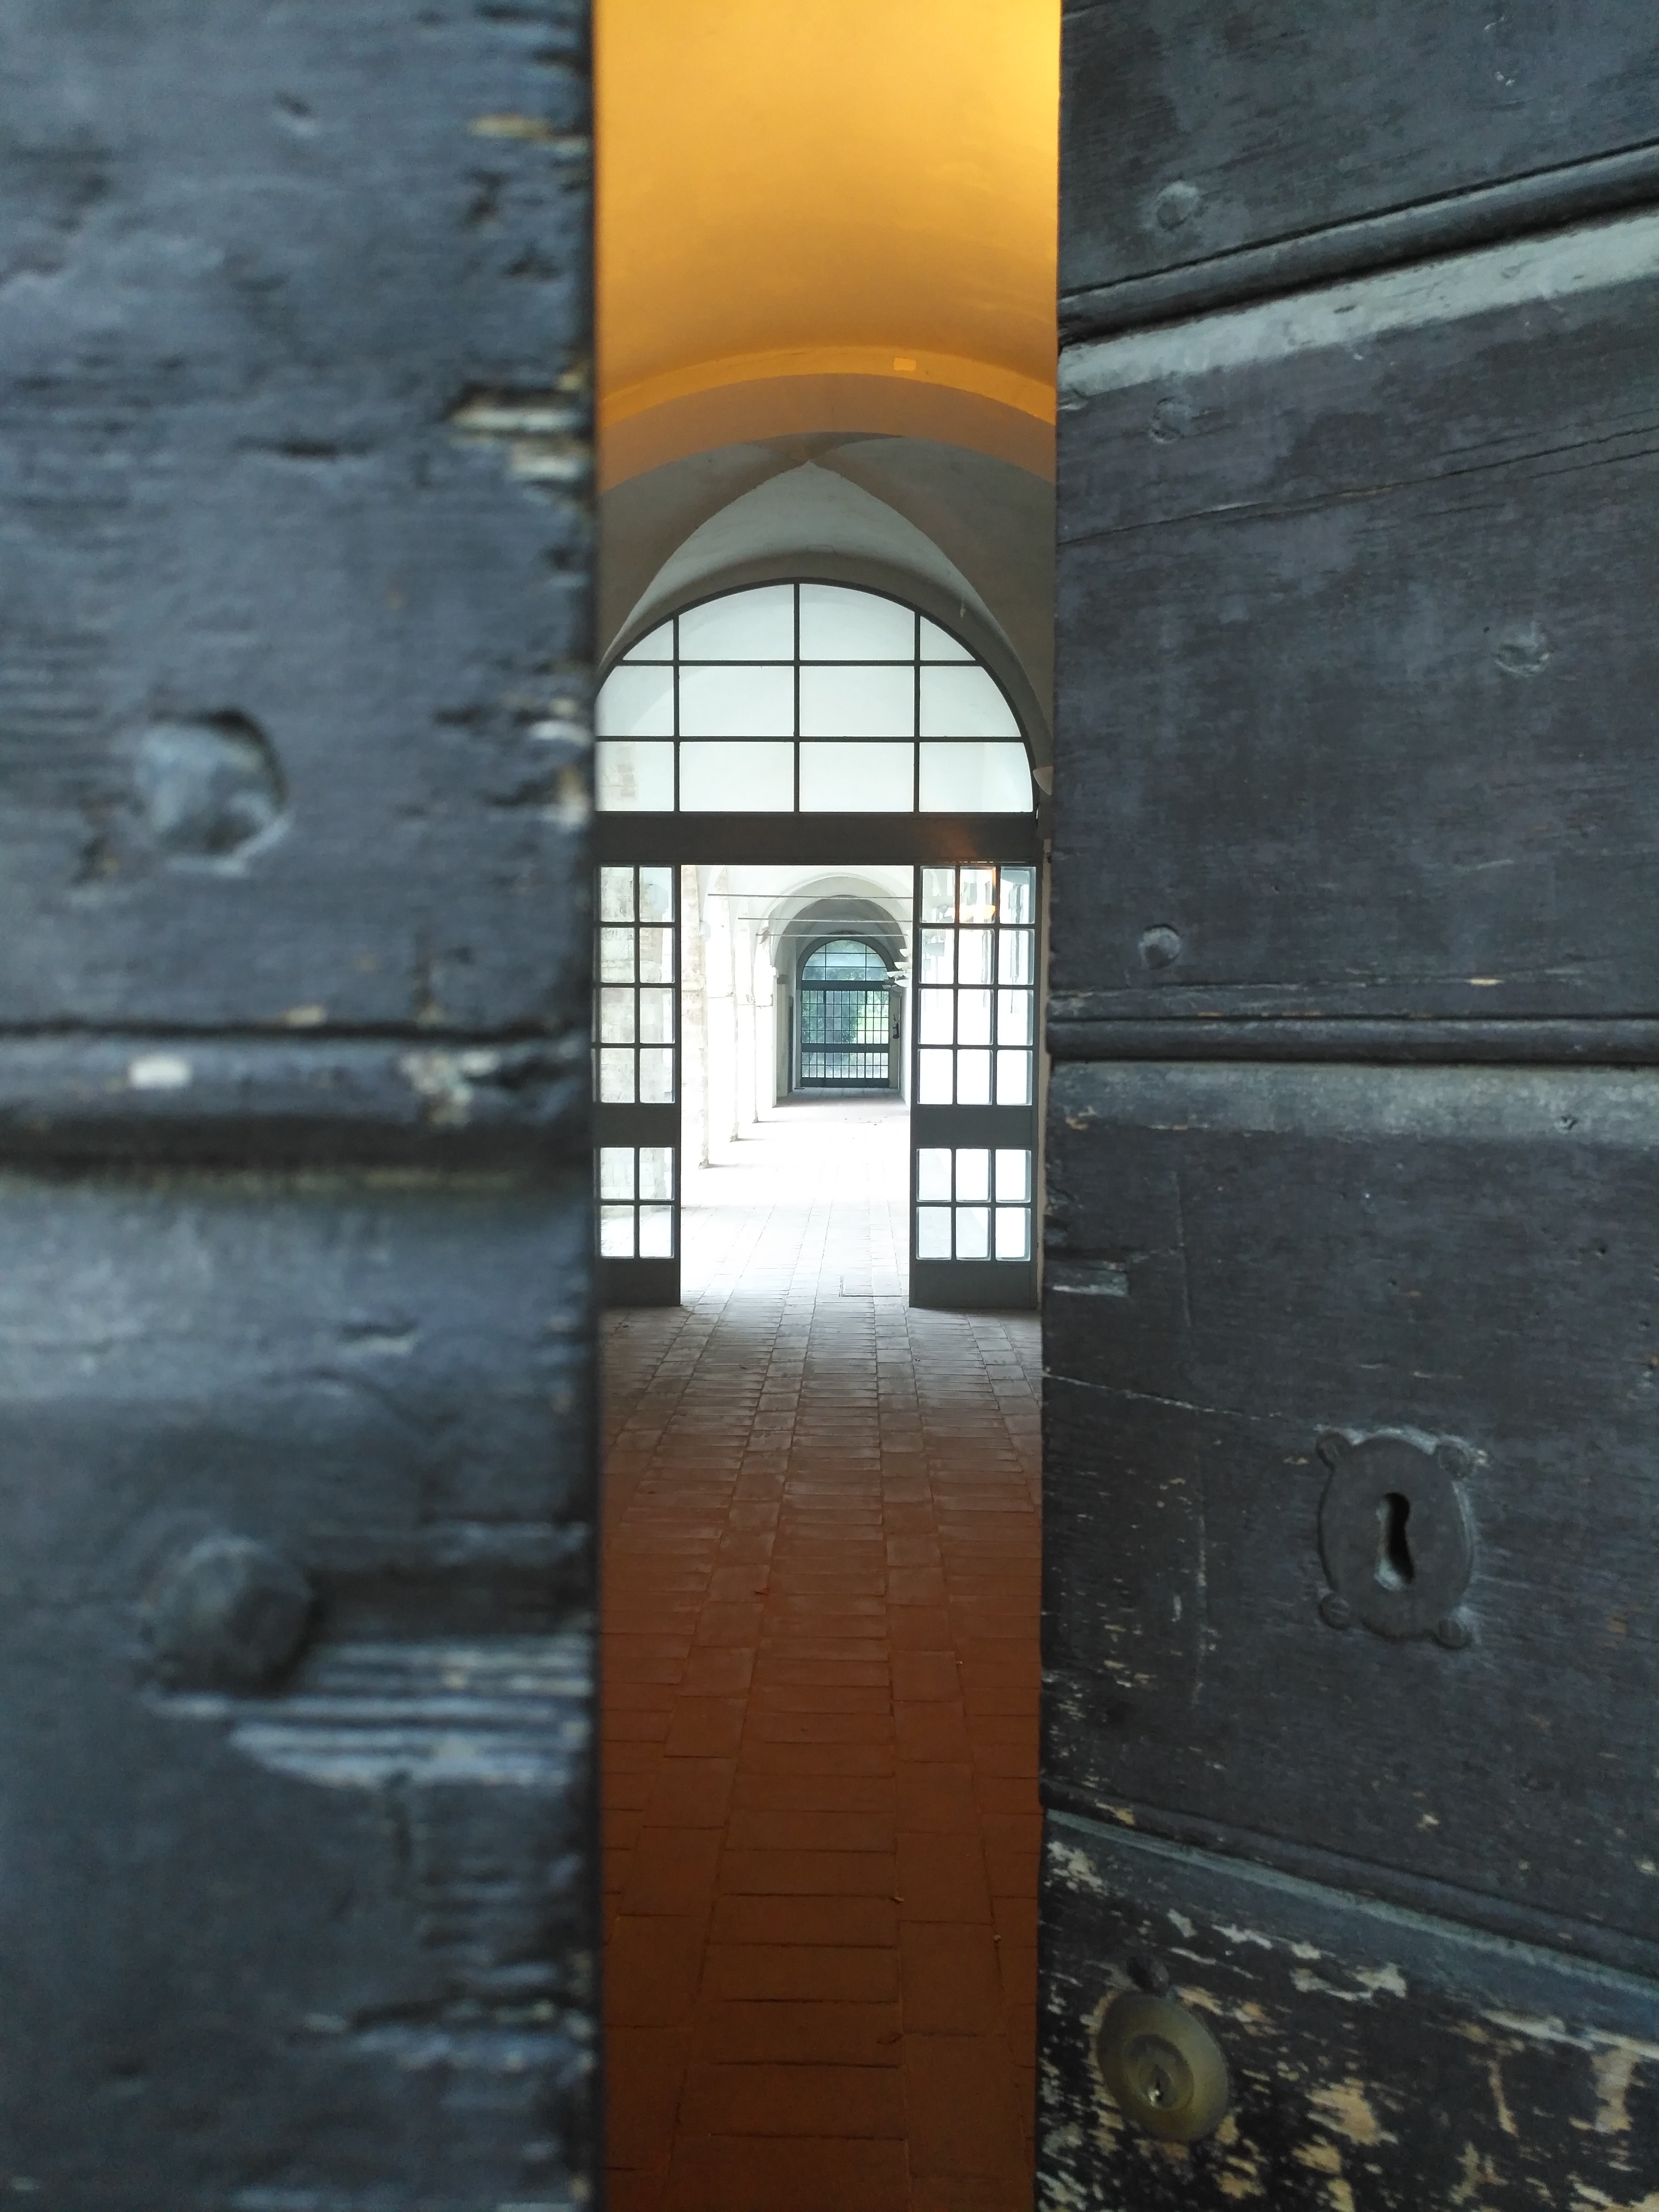 Convento Francescano - Gubbio | Via di Francesco